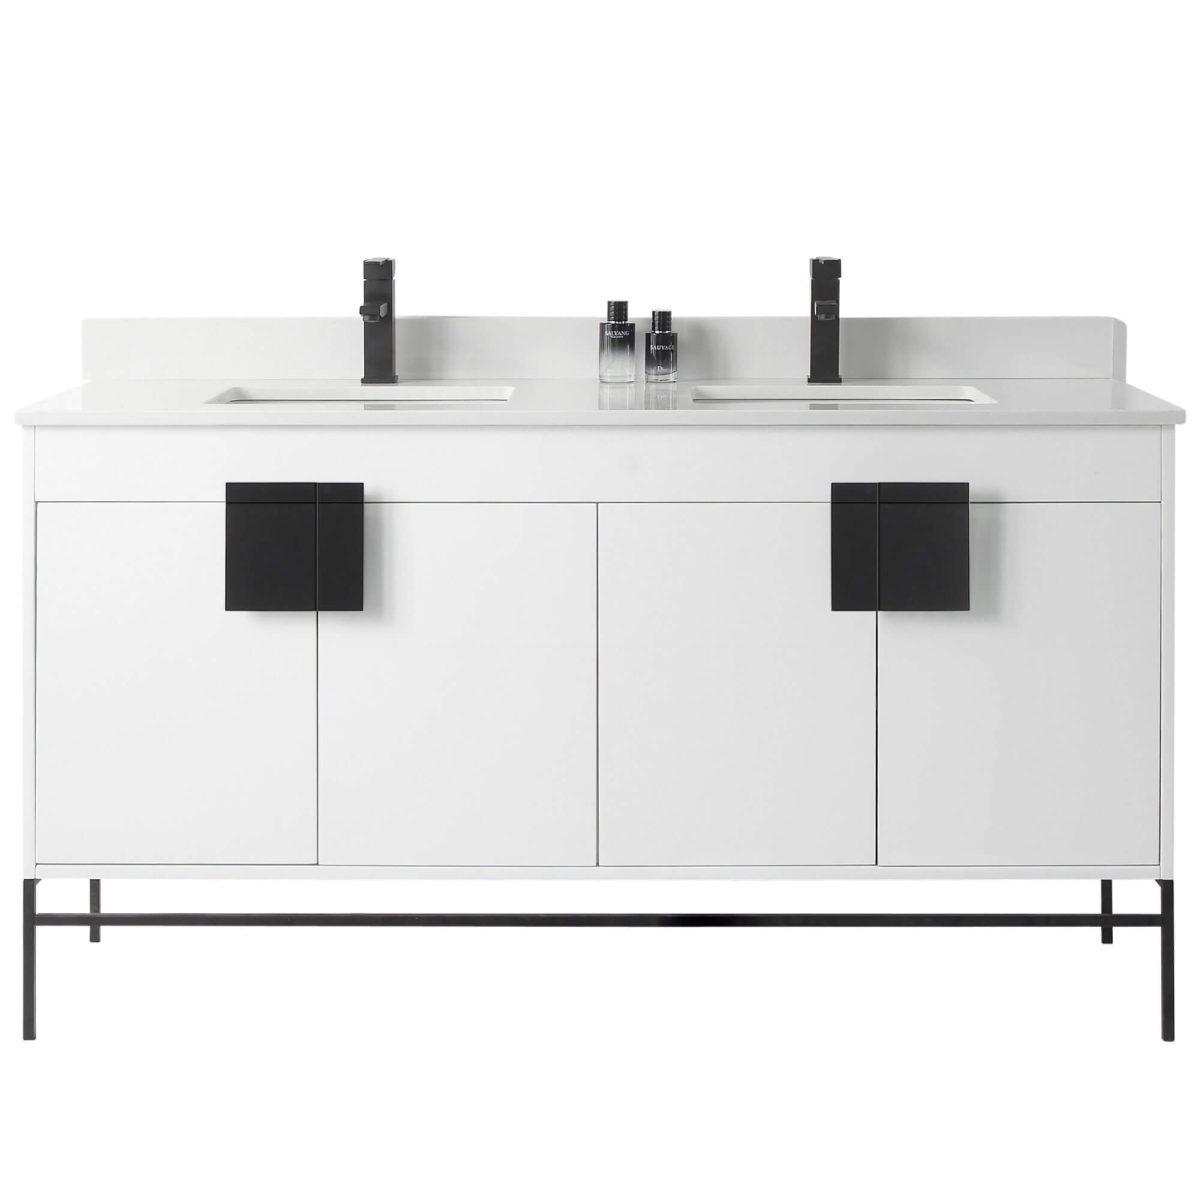 "Shawbridge 60"" Modern Double Bathroom Vanity  White with Black Hardware"